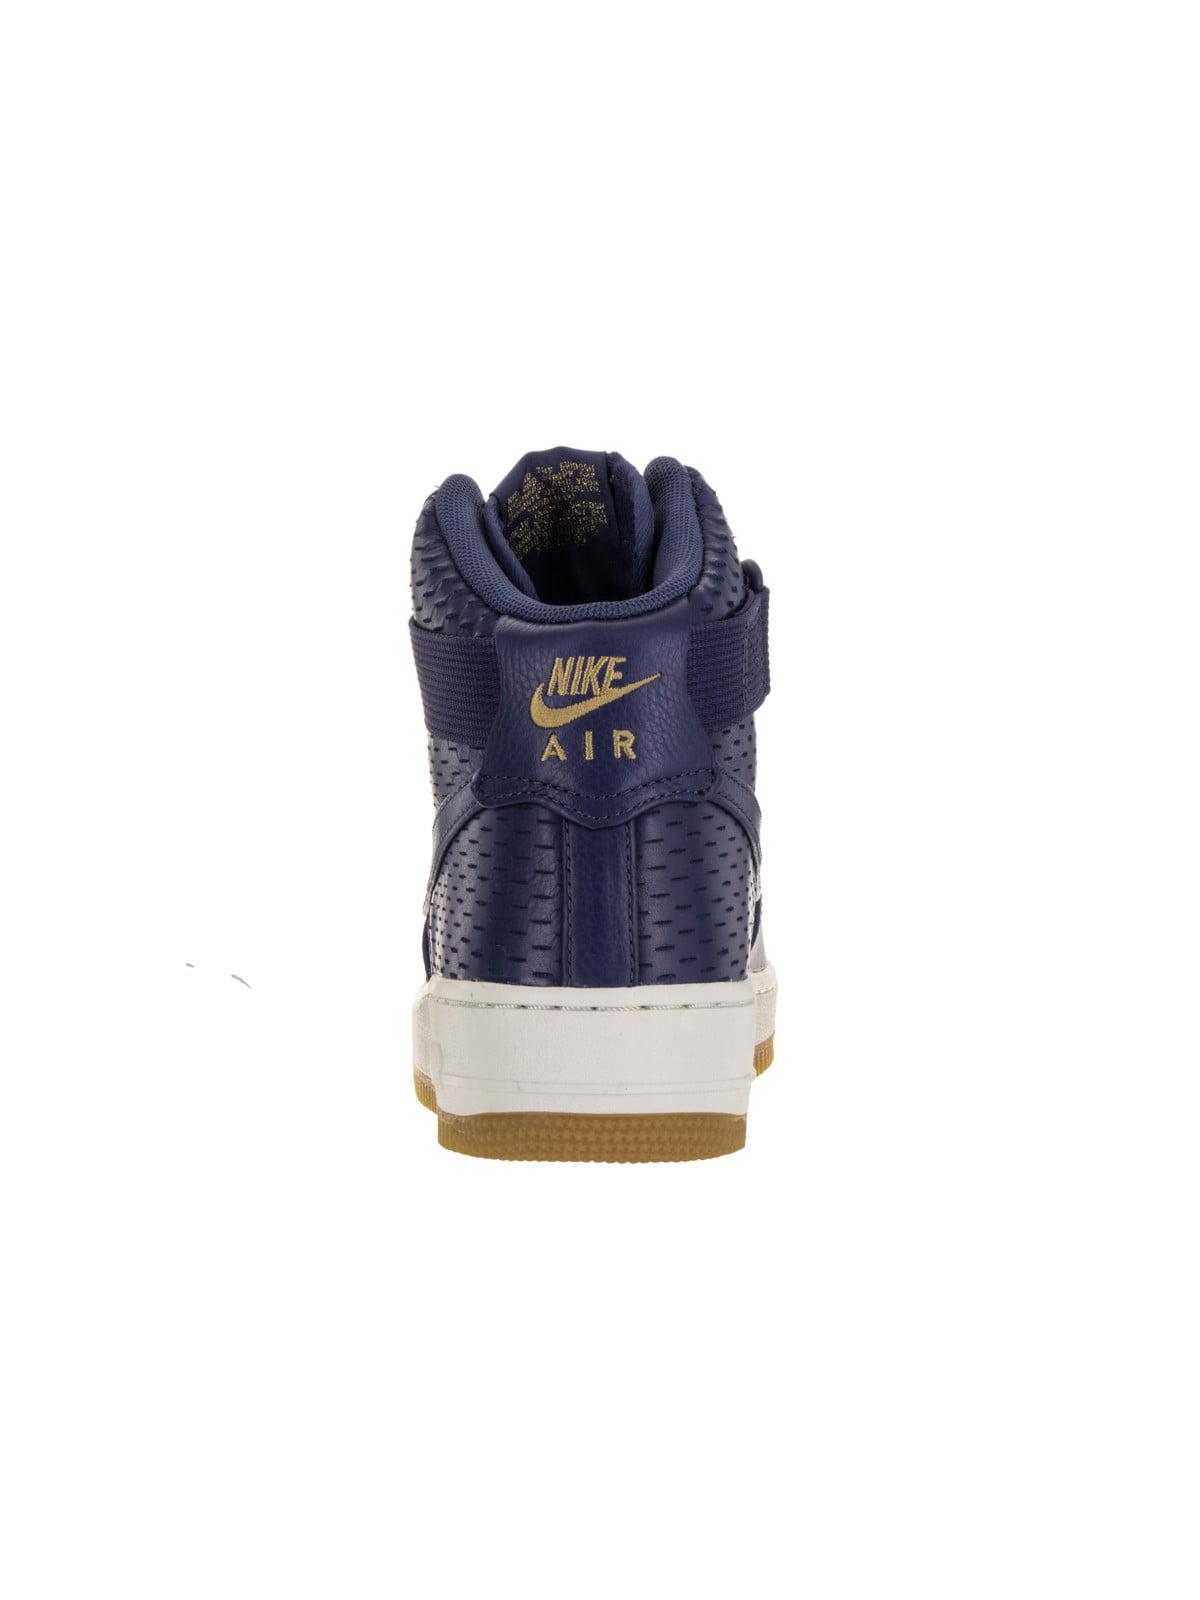 Nike 654440-501: Women's Air Force 1 Hi Prm Dk Purple Dust Basketball Shoe (Dk Purple Dust/Dk Purple Dust, 9.5 B(M) US)